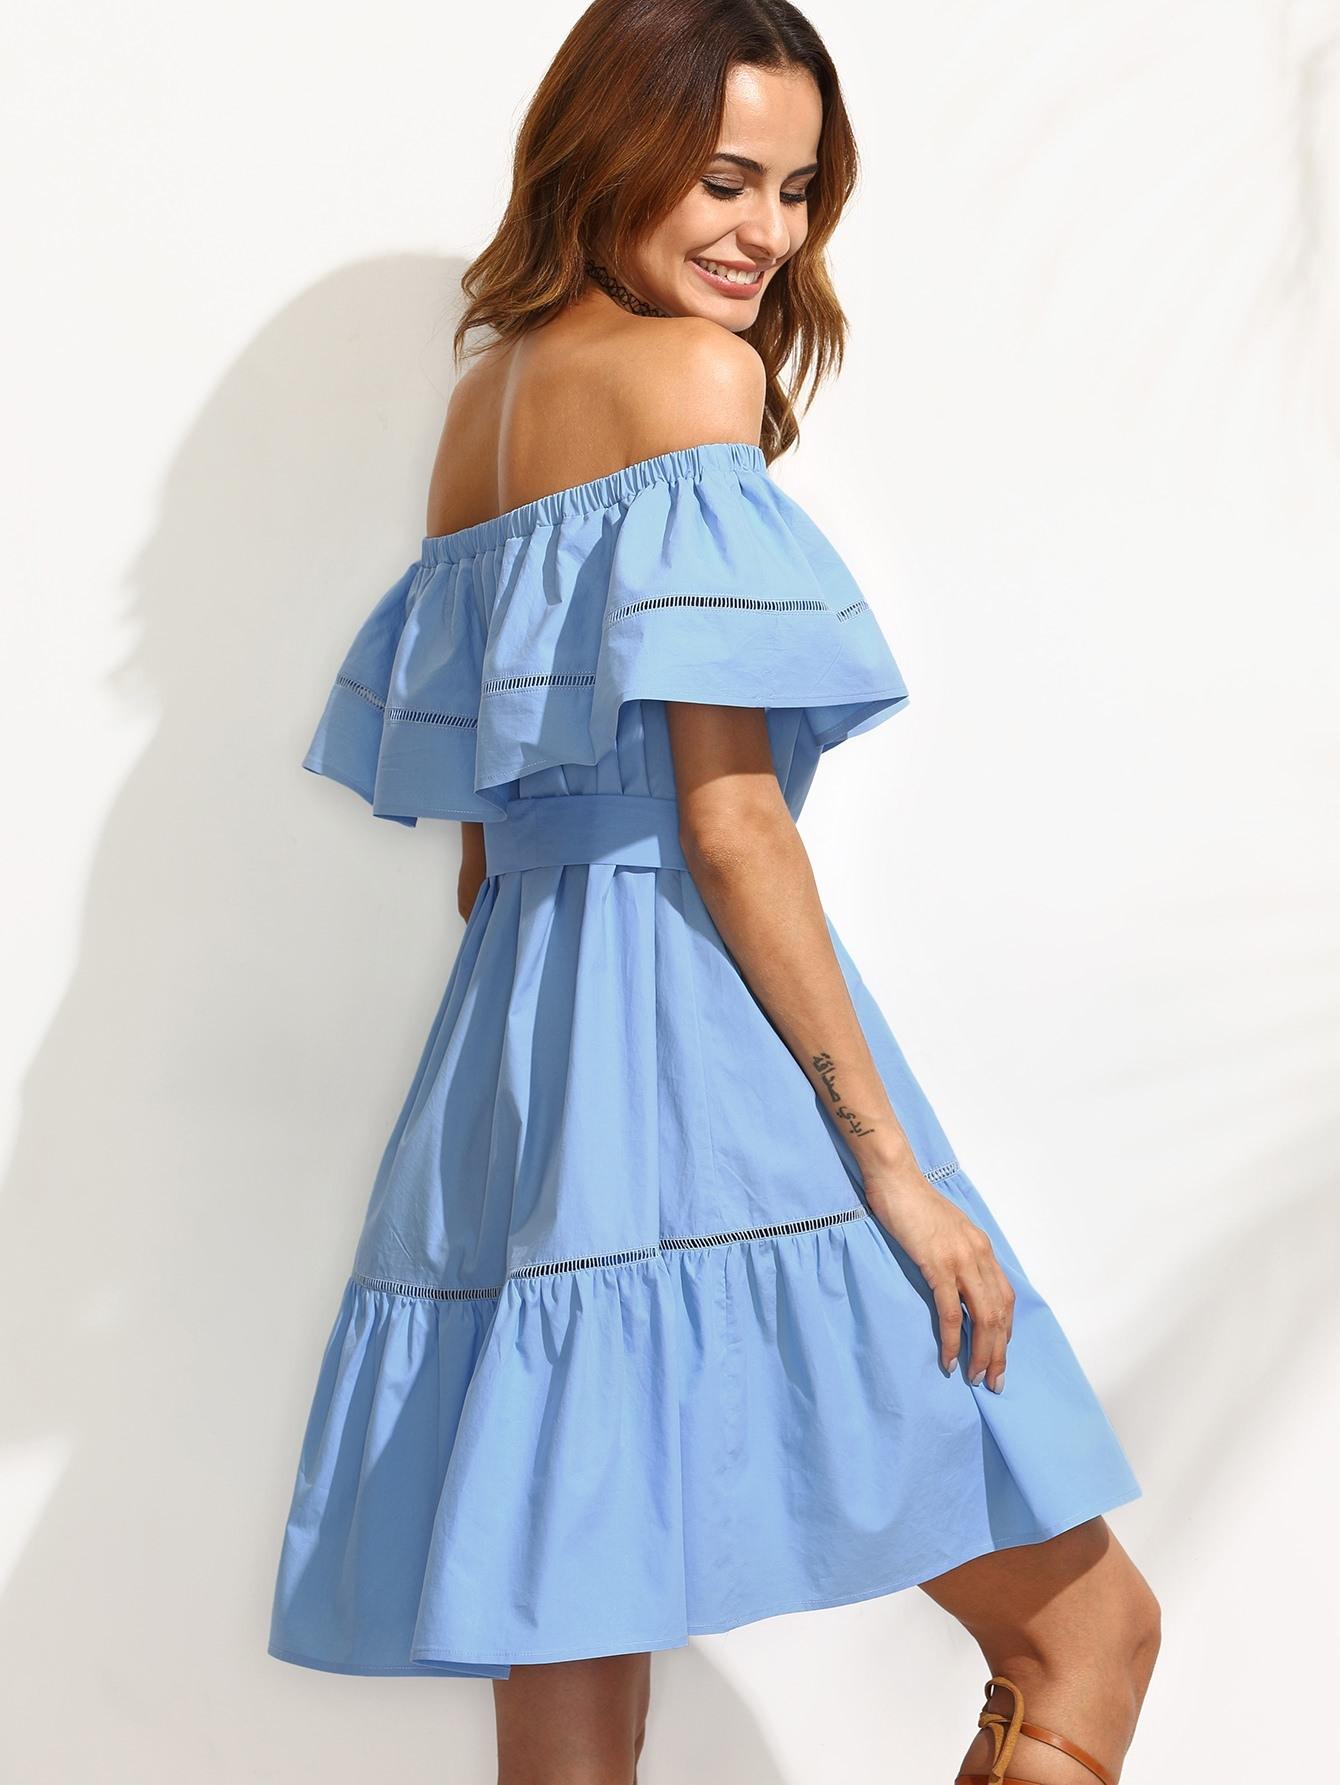 Abend Schön Kleid Blau Kurz Galerie17 Elegant Kleid Blau Kurz Stylish